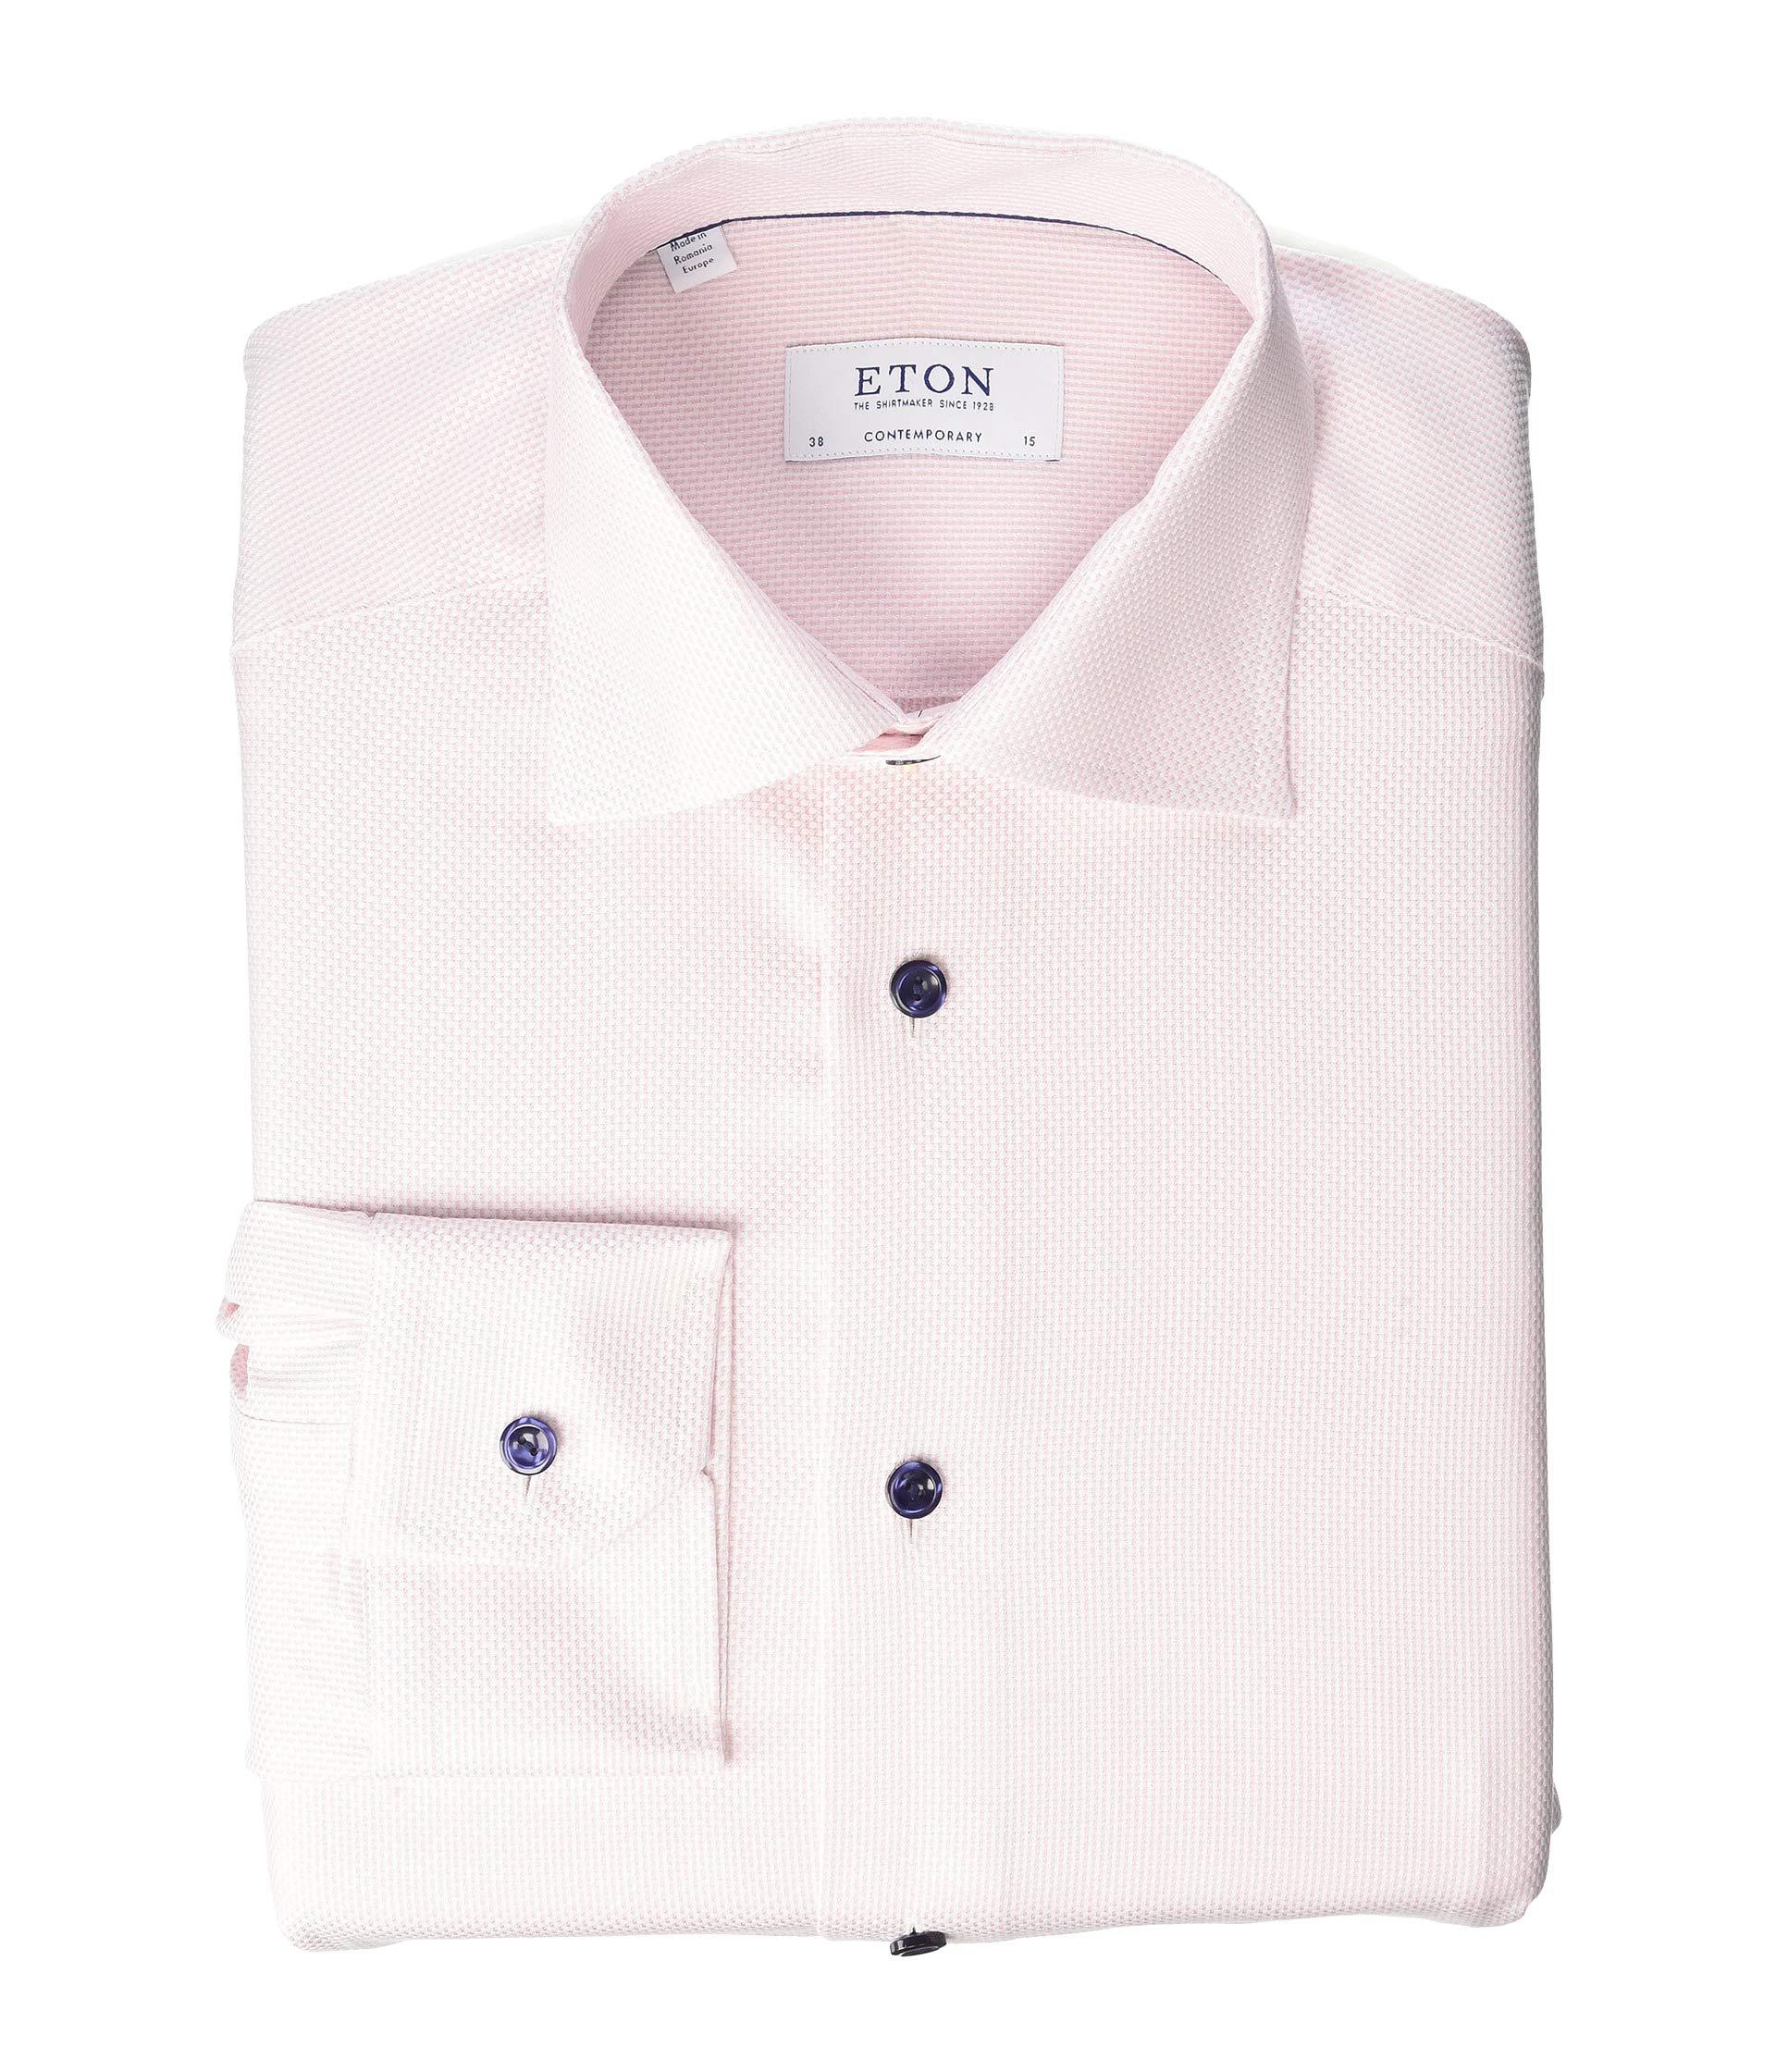 Eton Contemporary Fit Textured Dress Shirt At Luxuryppos